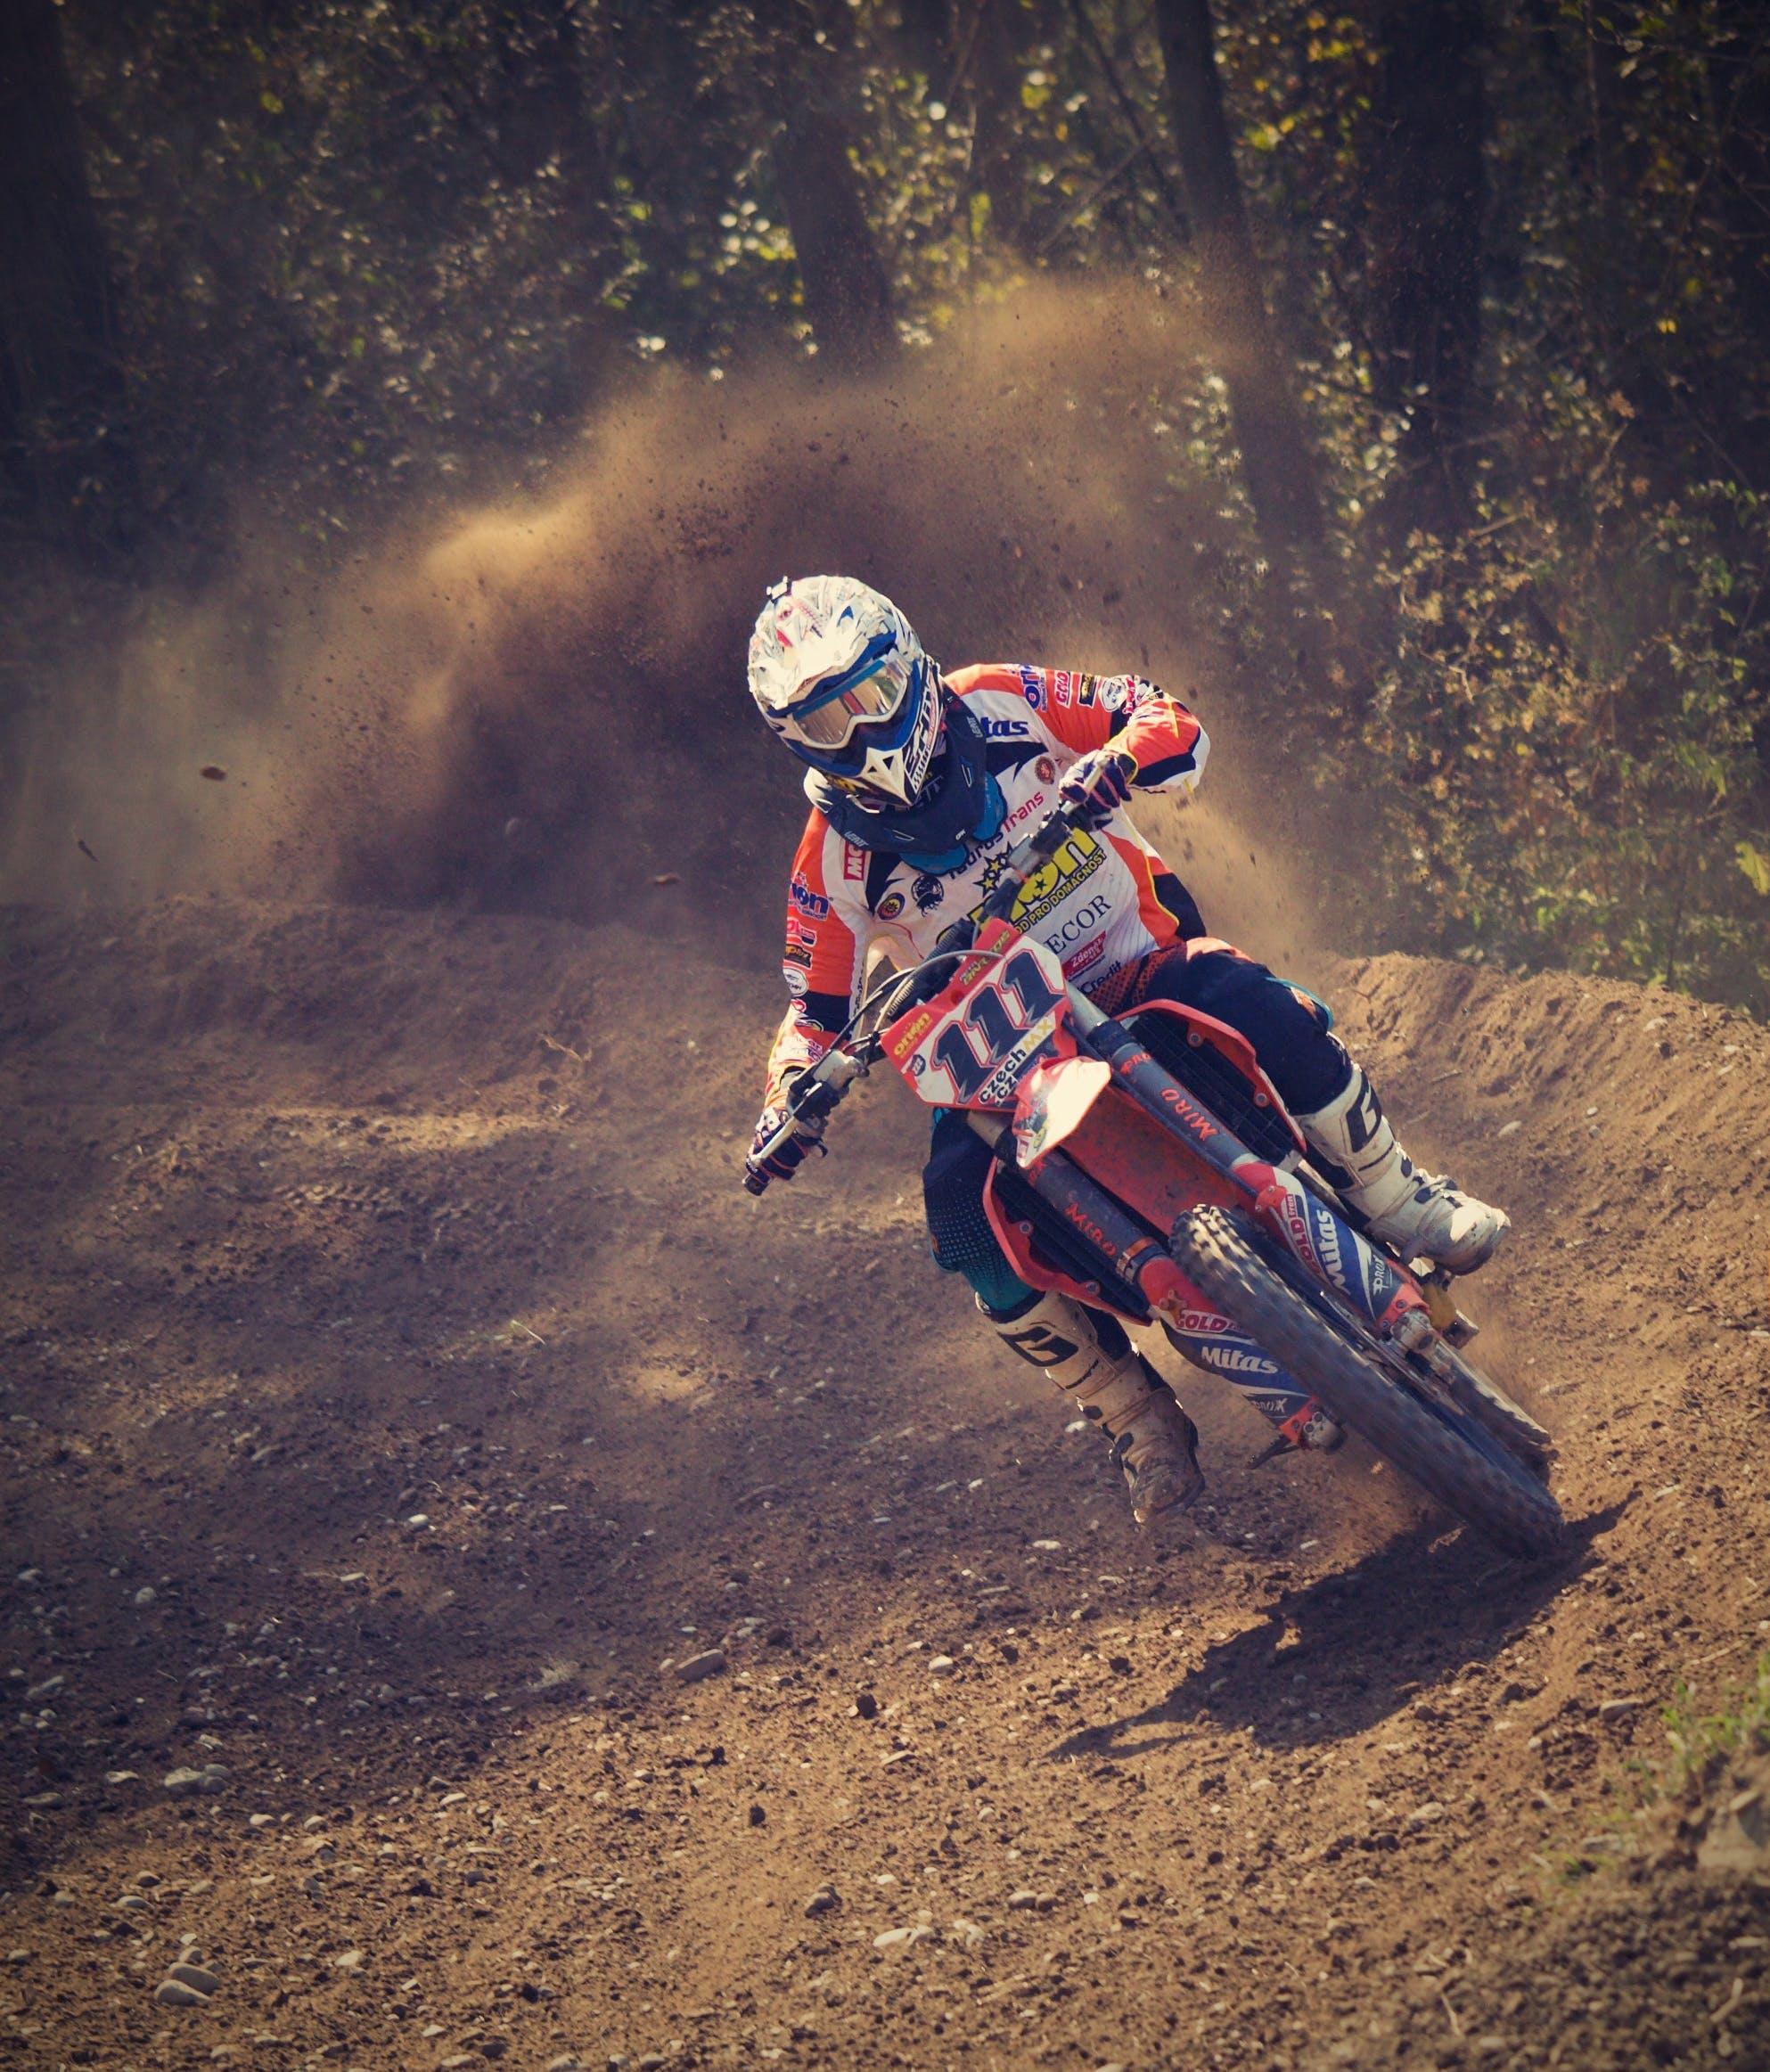 Man in White and Orange Motocross Overall Riding His Motocross Dirt Bike during Daytime